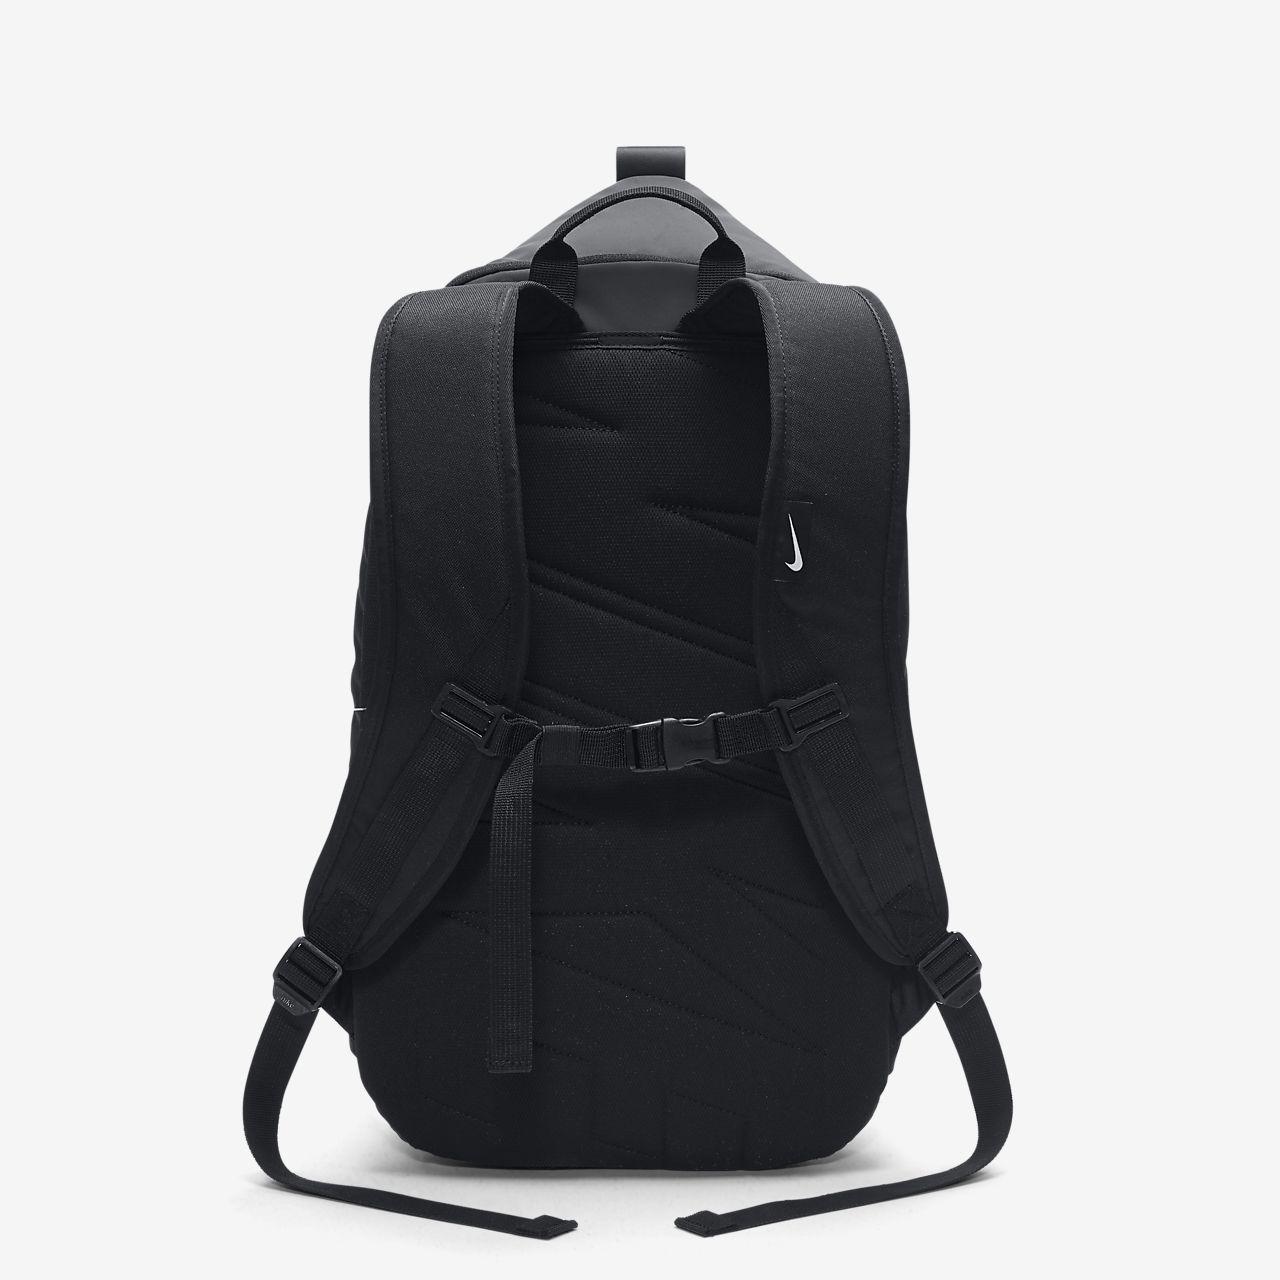 472220f7b748 Low Resolution Nike FB Centerline Football Backpack Nike FB Centerline  Football Backpack